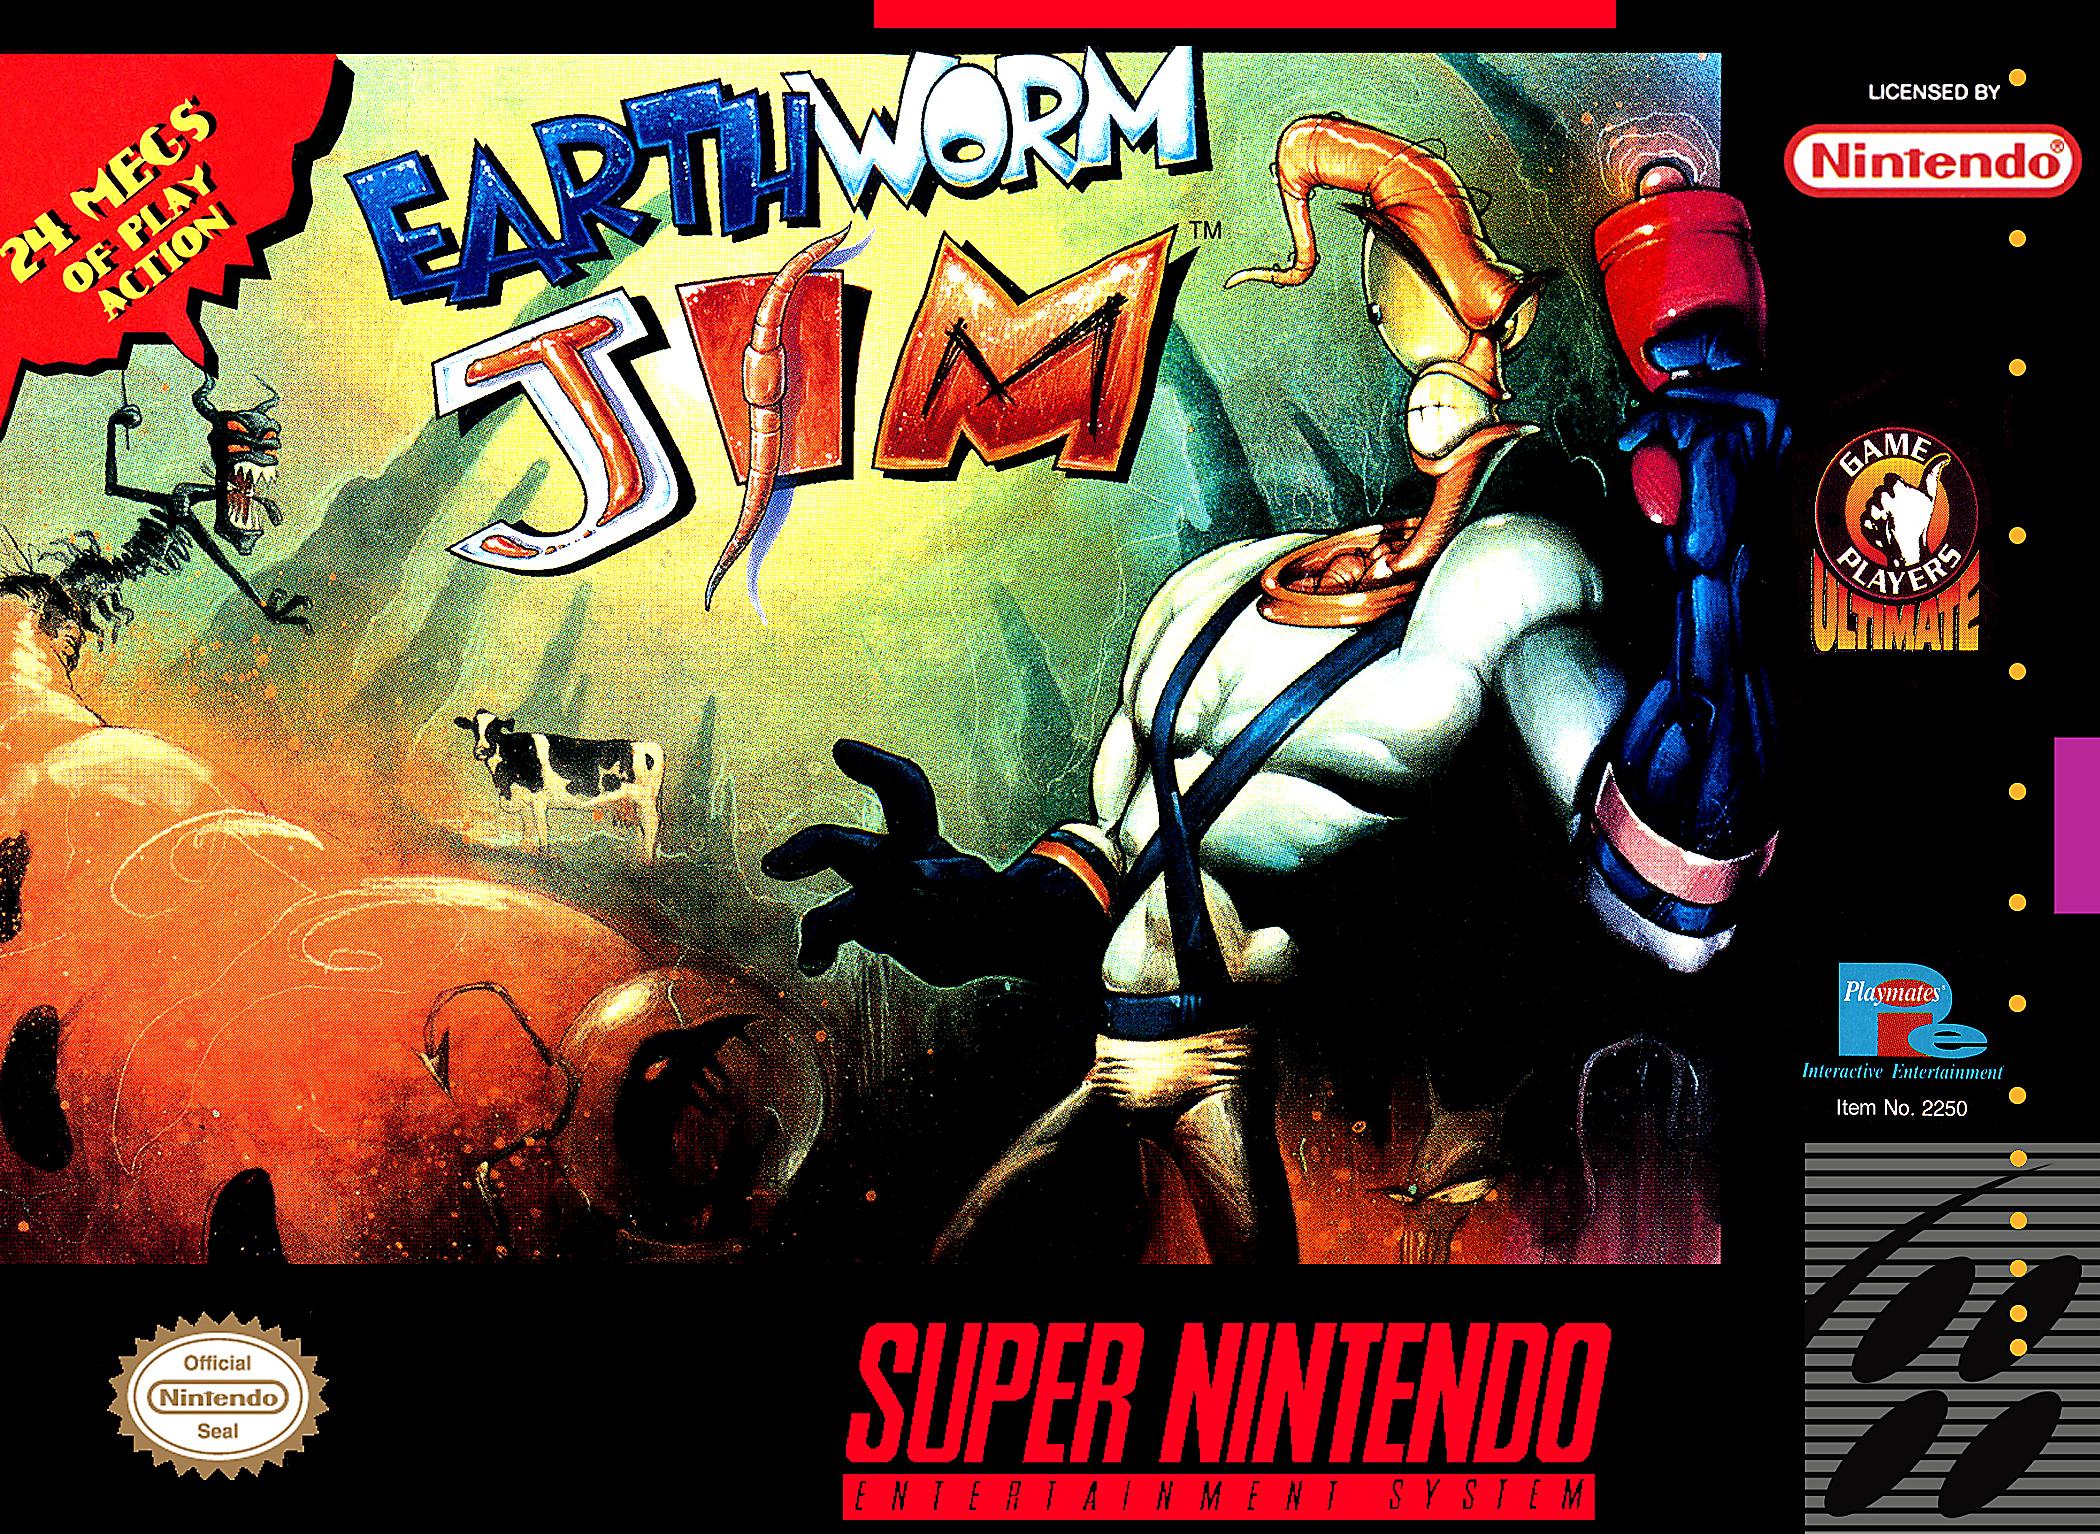 Earthworm Jim/SNES